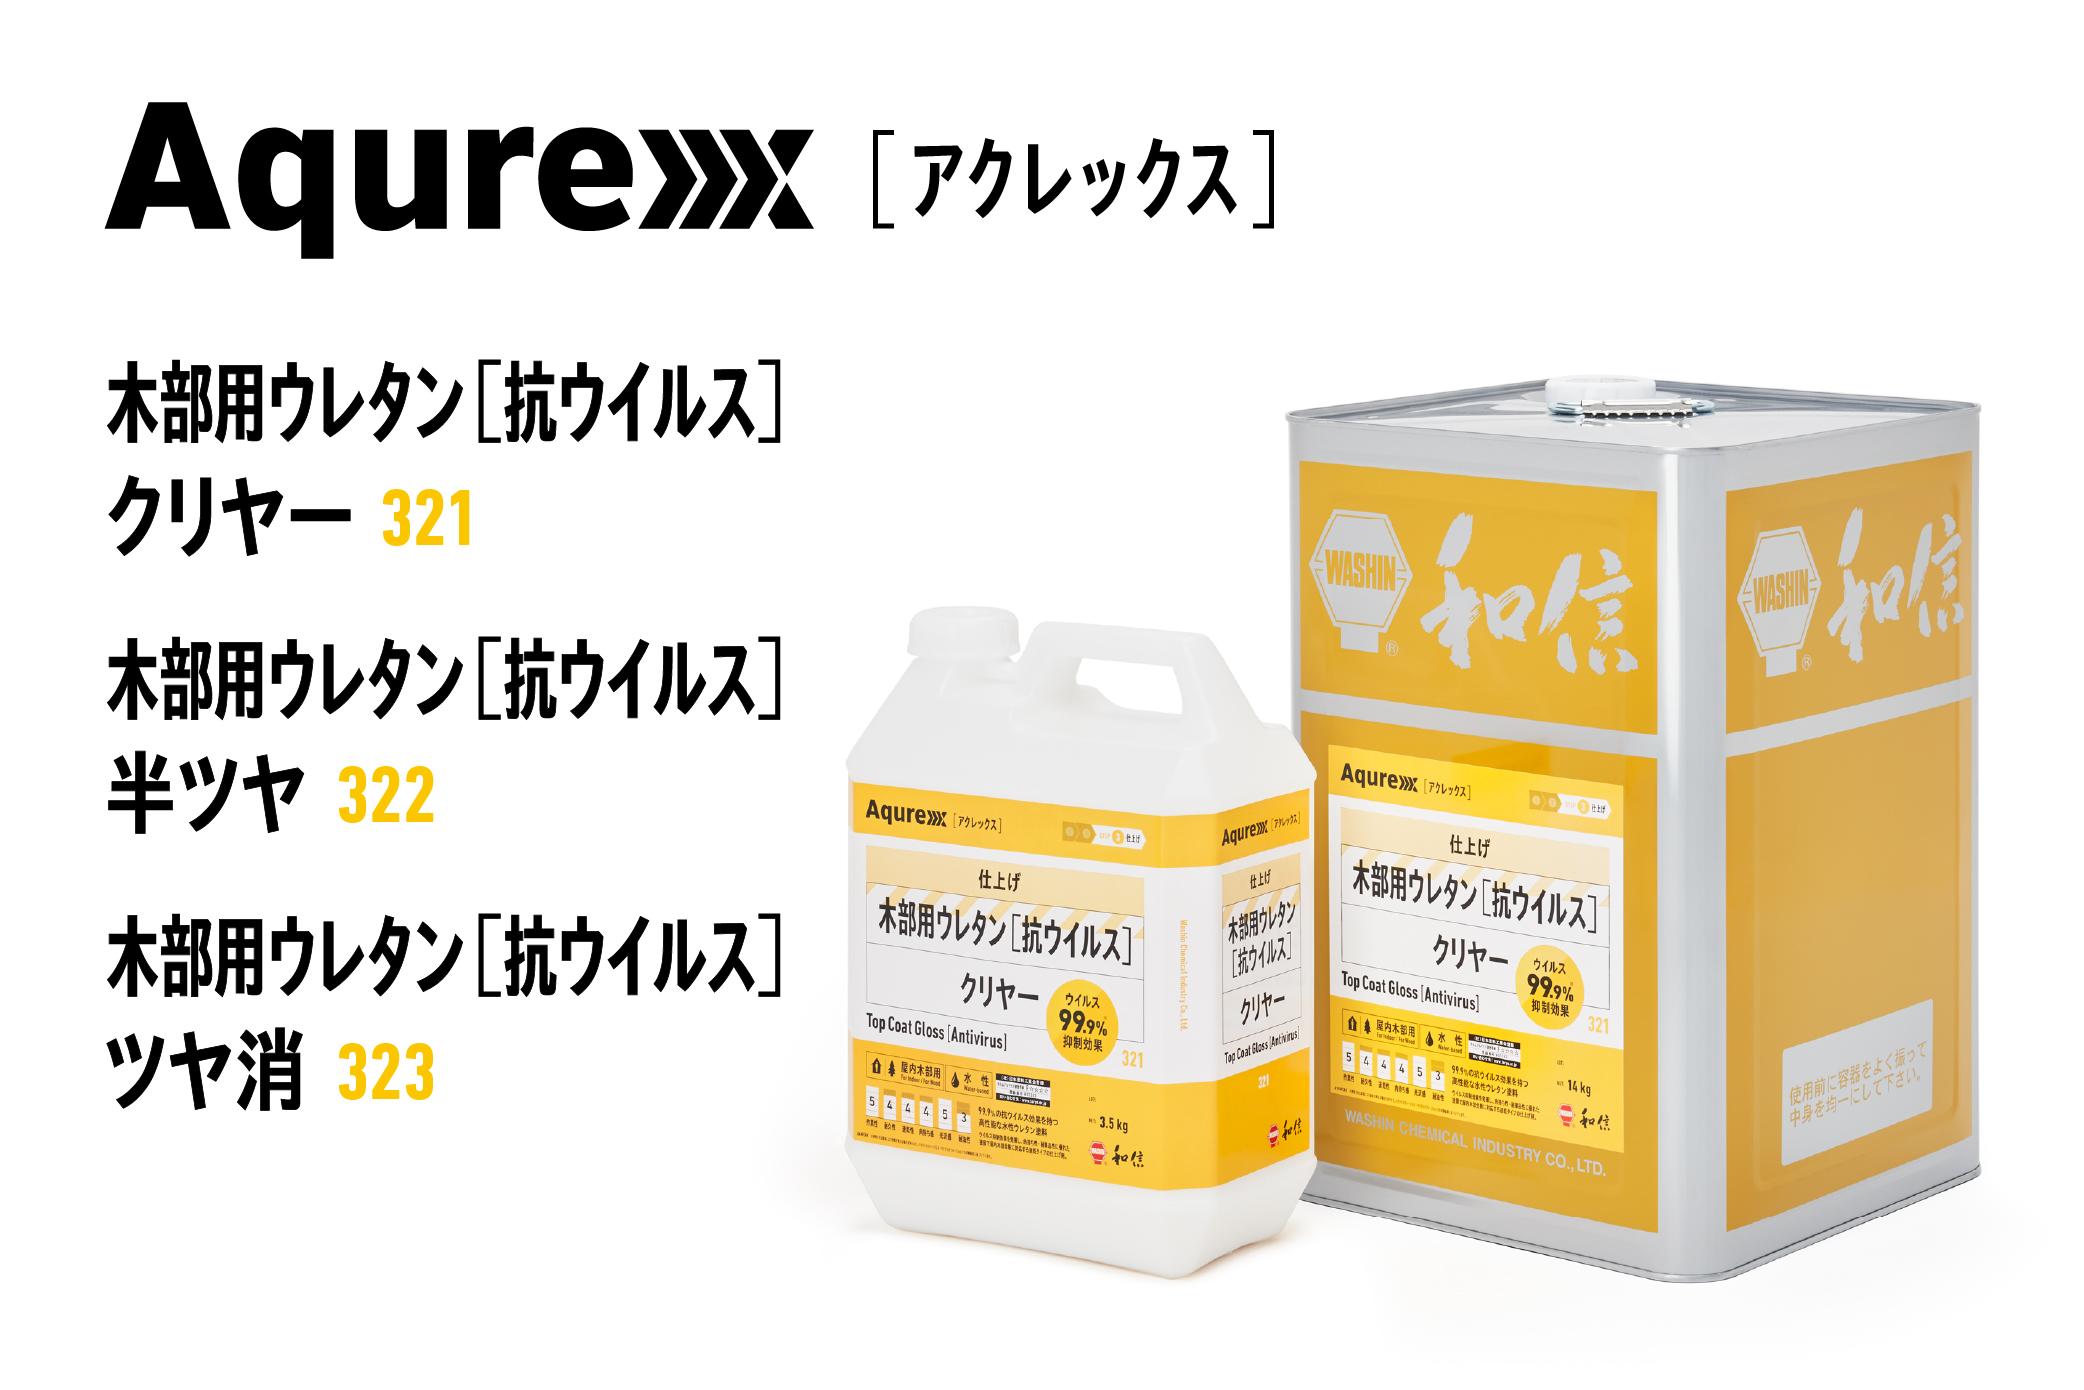 Aqurex 木部用ウレタン[抗ウイルス] クリヤー / 半ツヤ / ツヤ消